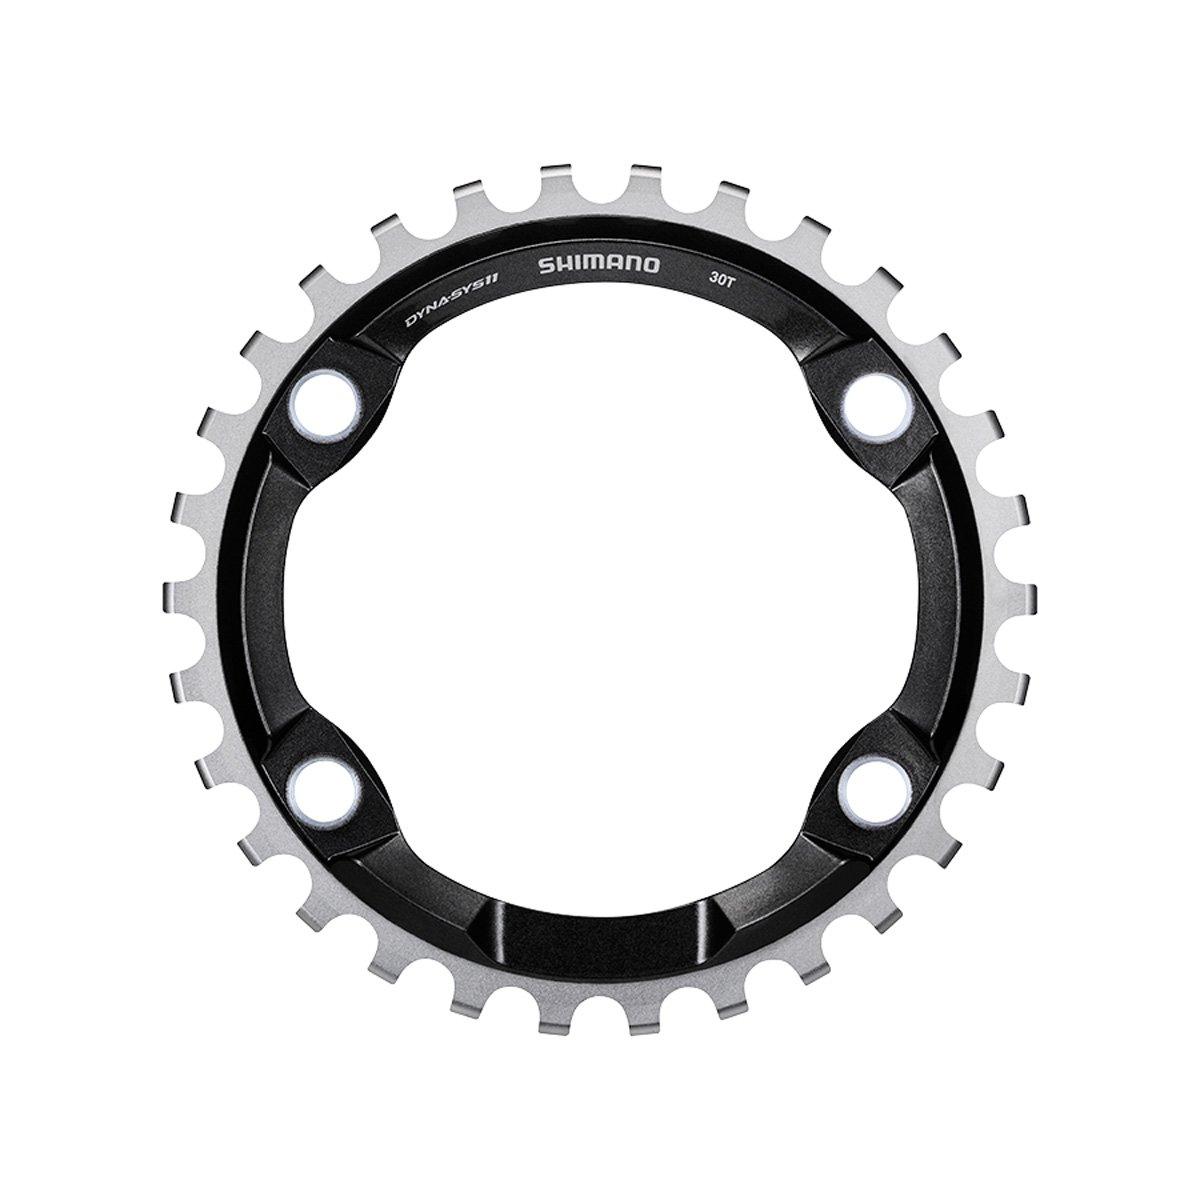 Shimano Deore XT m8000マウンテン自転車Chainring – sm-crm81 B01K89U4B2 30T|1色 1色 30T